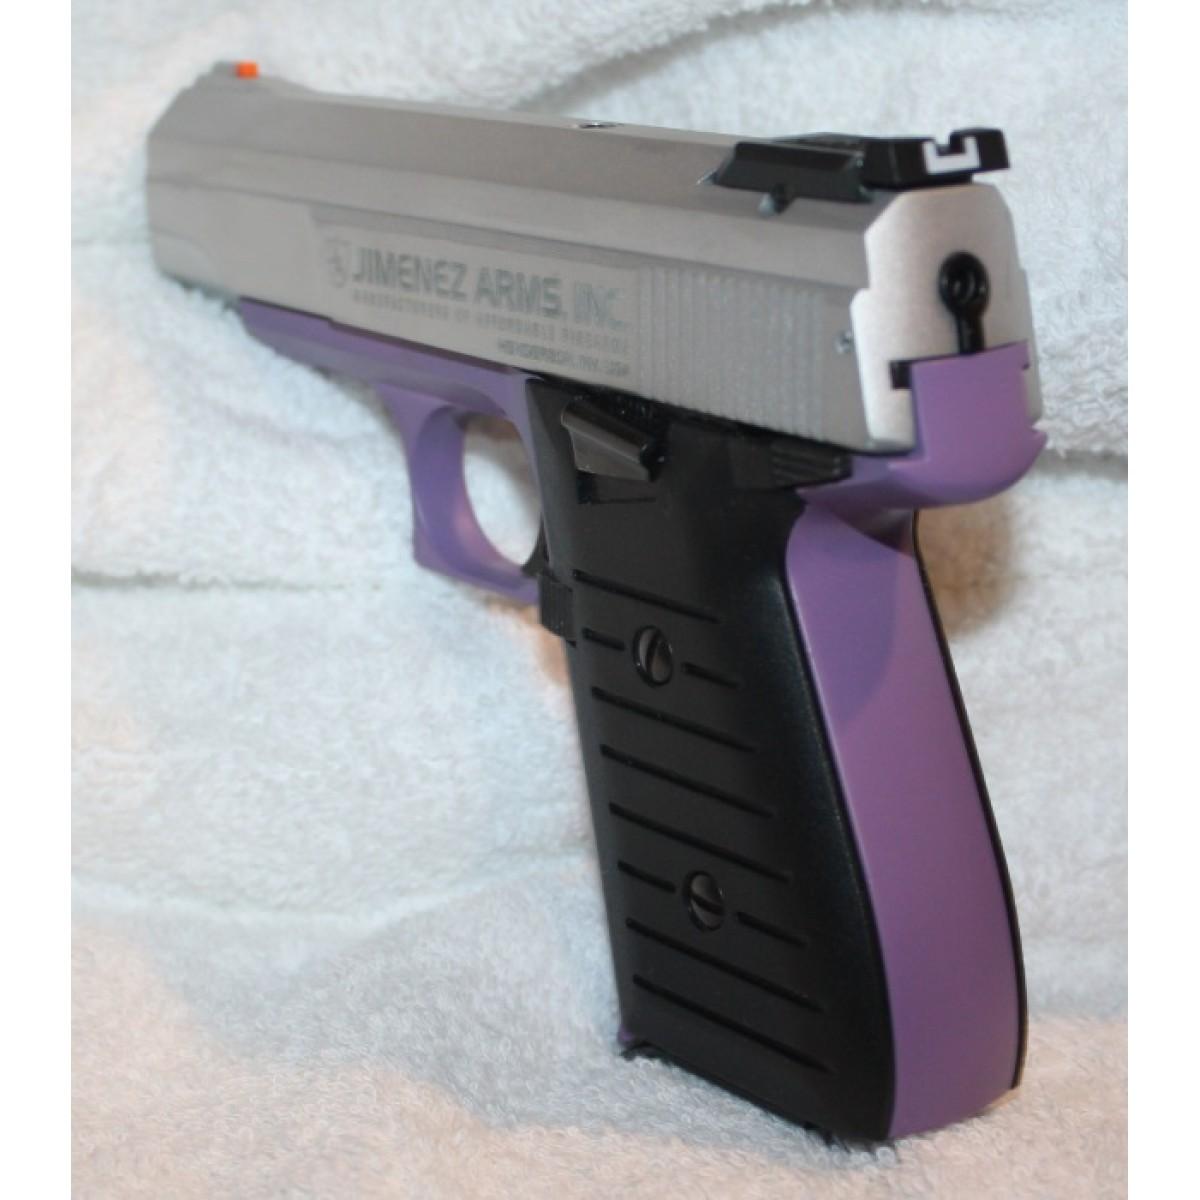 Jimenez Arms JA Nine Purple and Brushed Silver 9MM Semi Auto